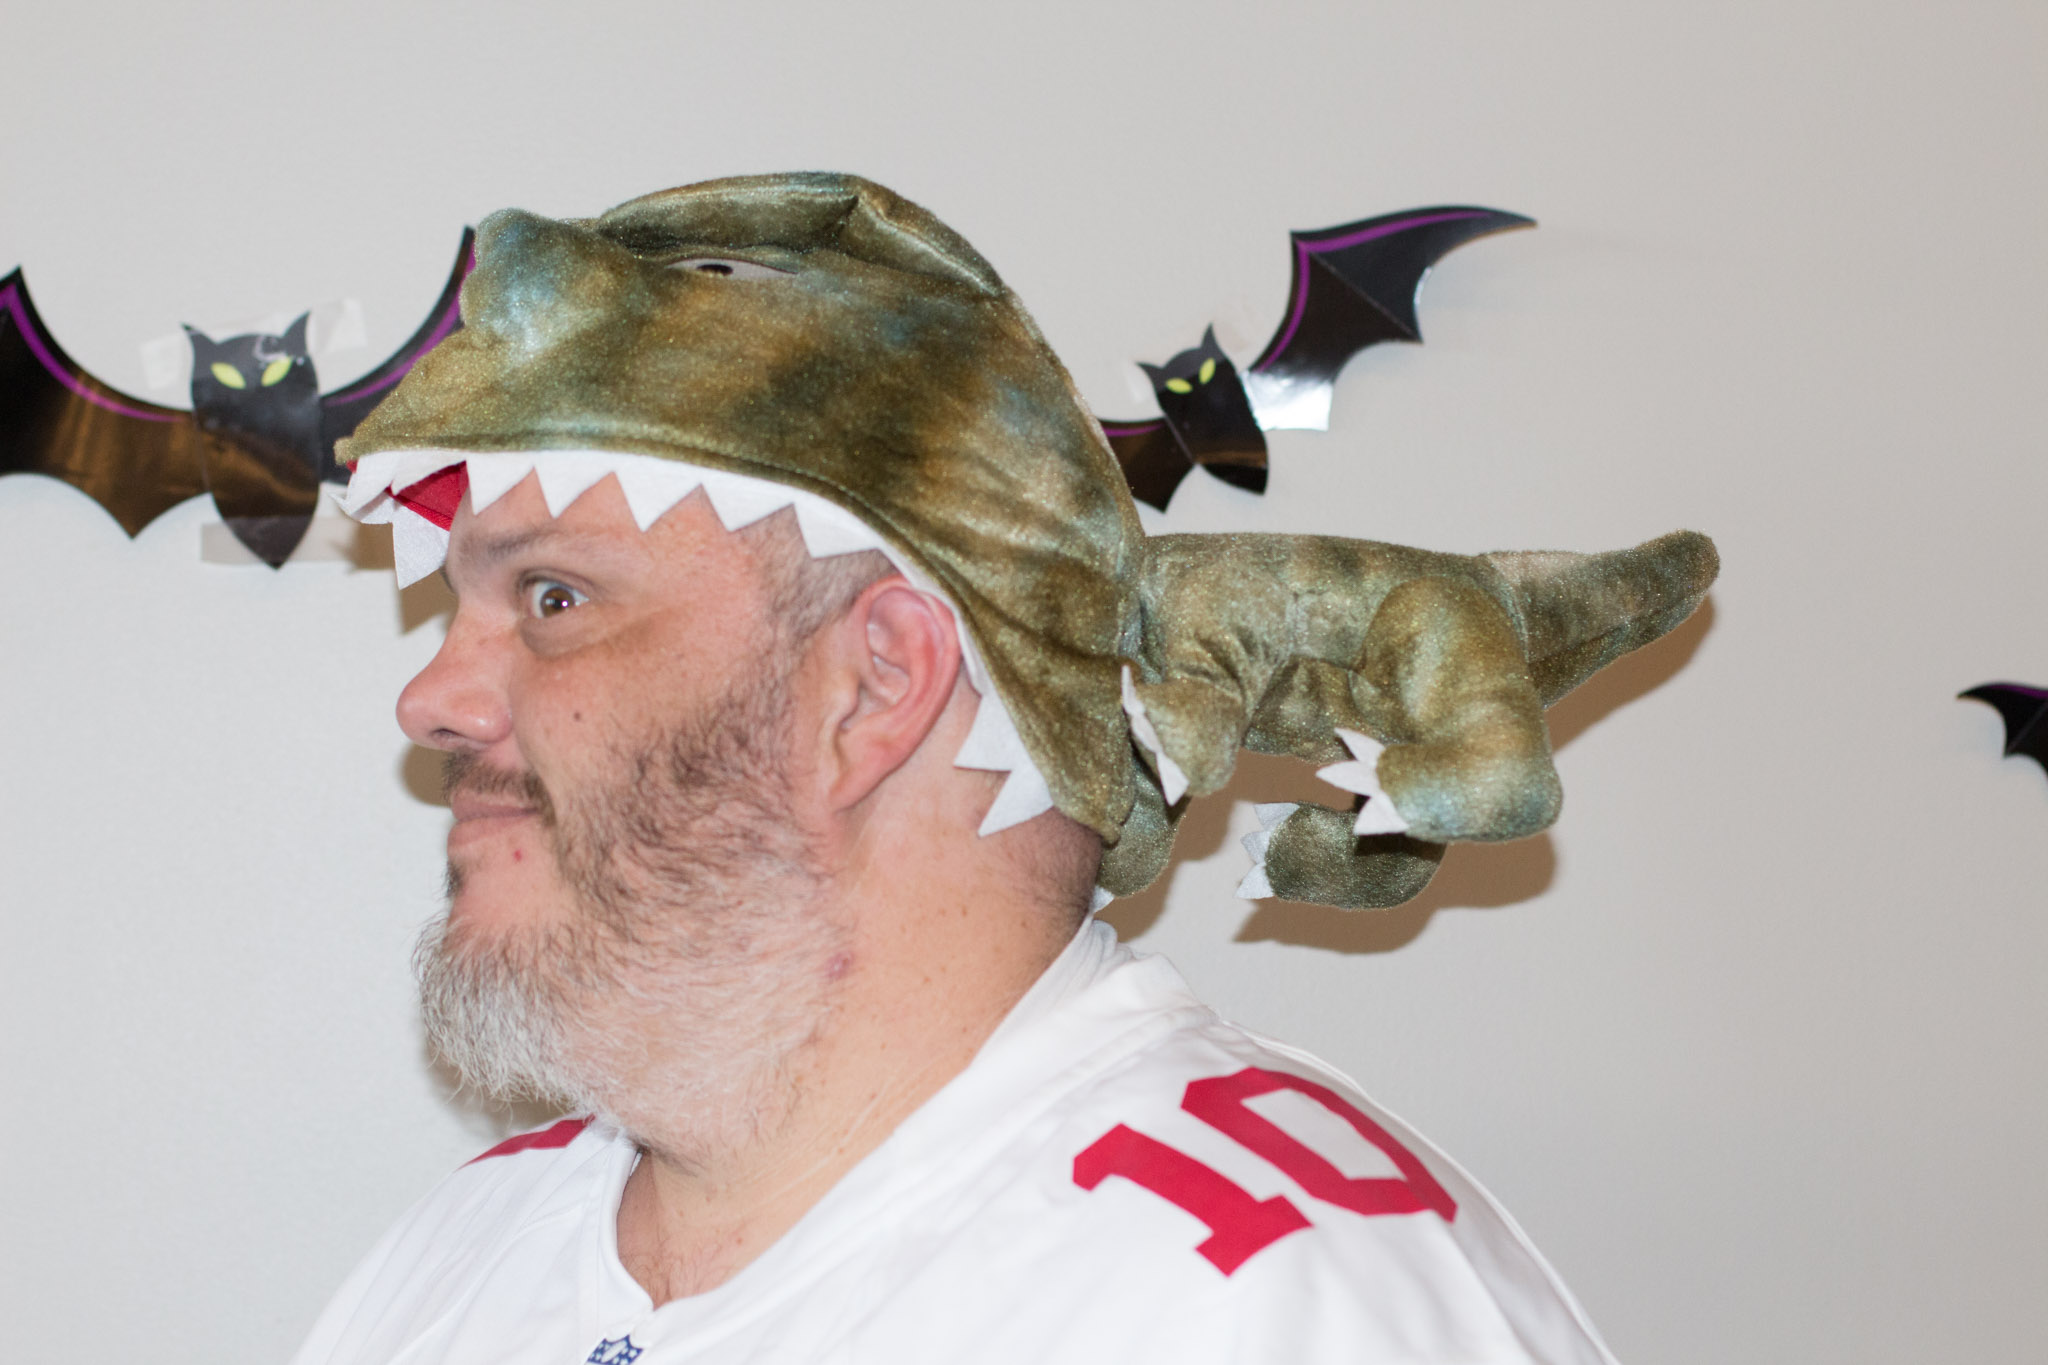 CJ Werlinger - Guy Being Eaten by a Baby Dinosaur